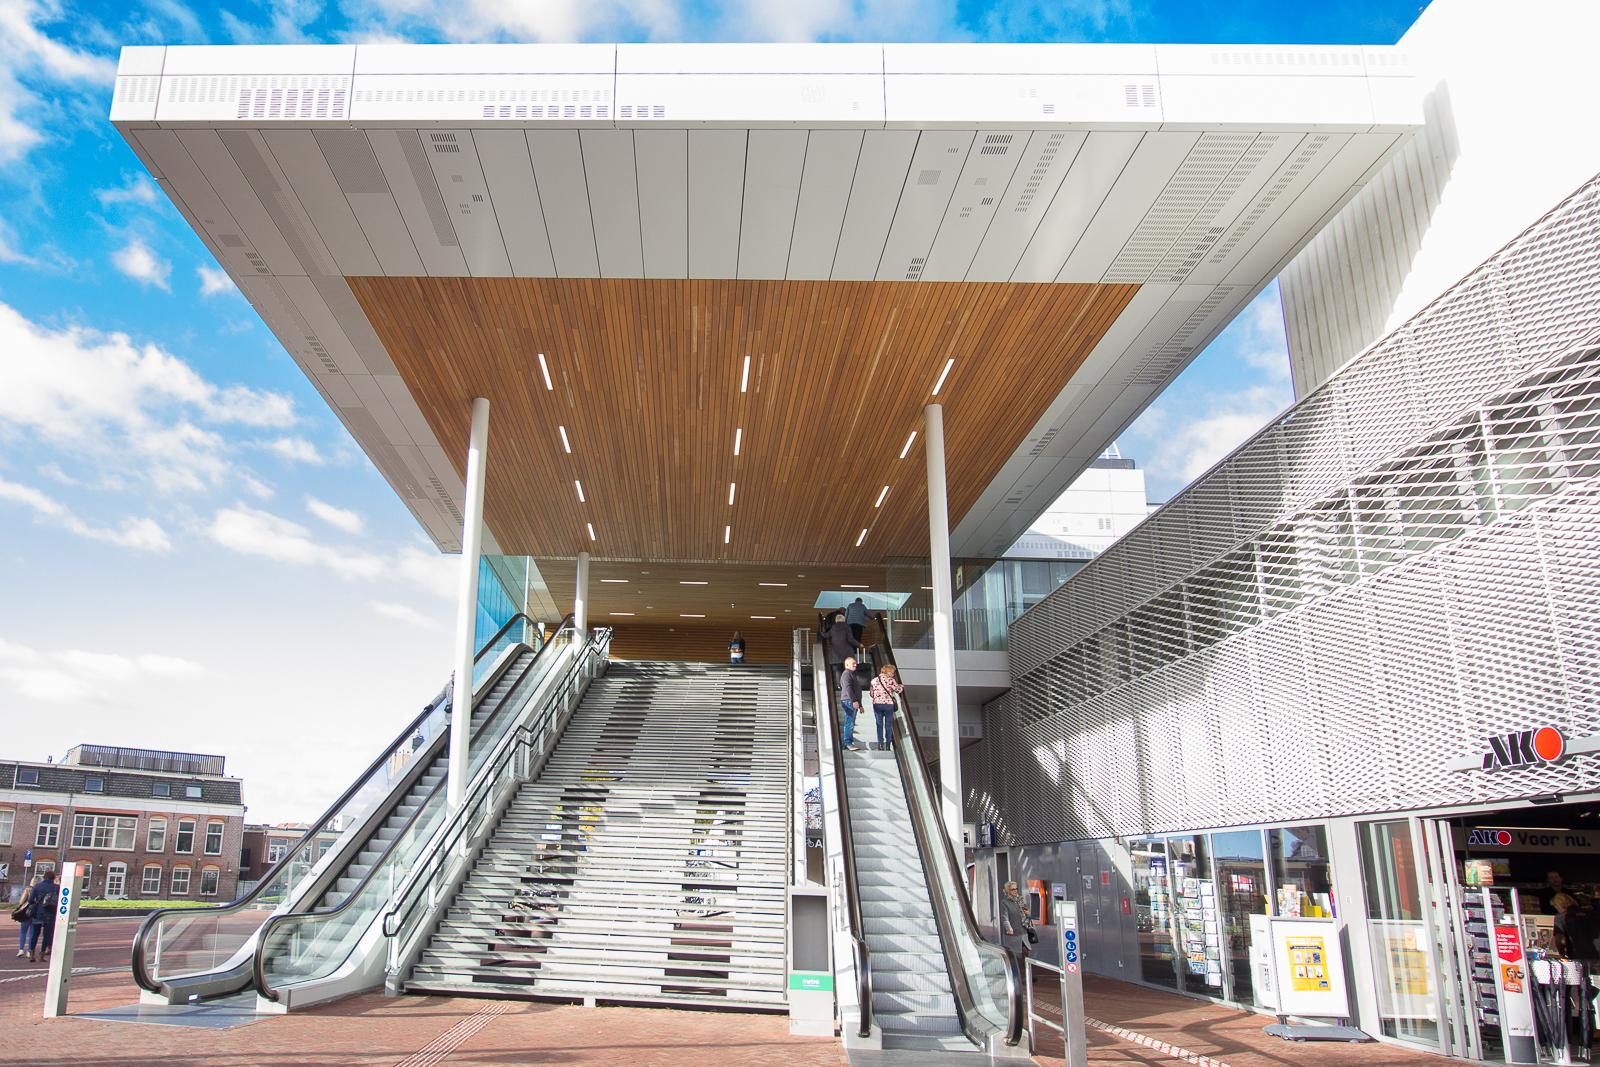 station_alkmaar_16